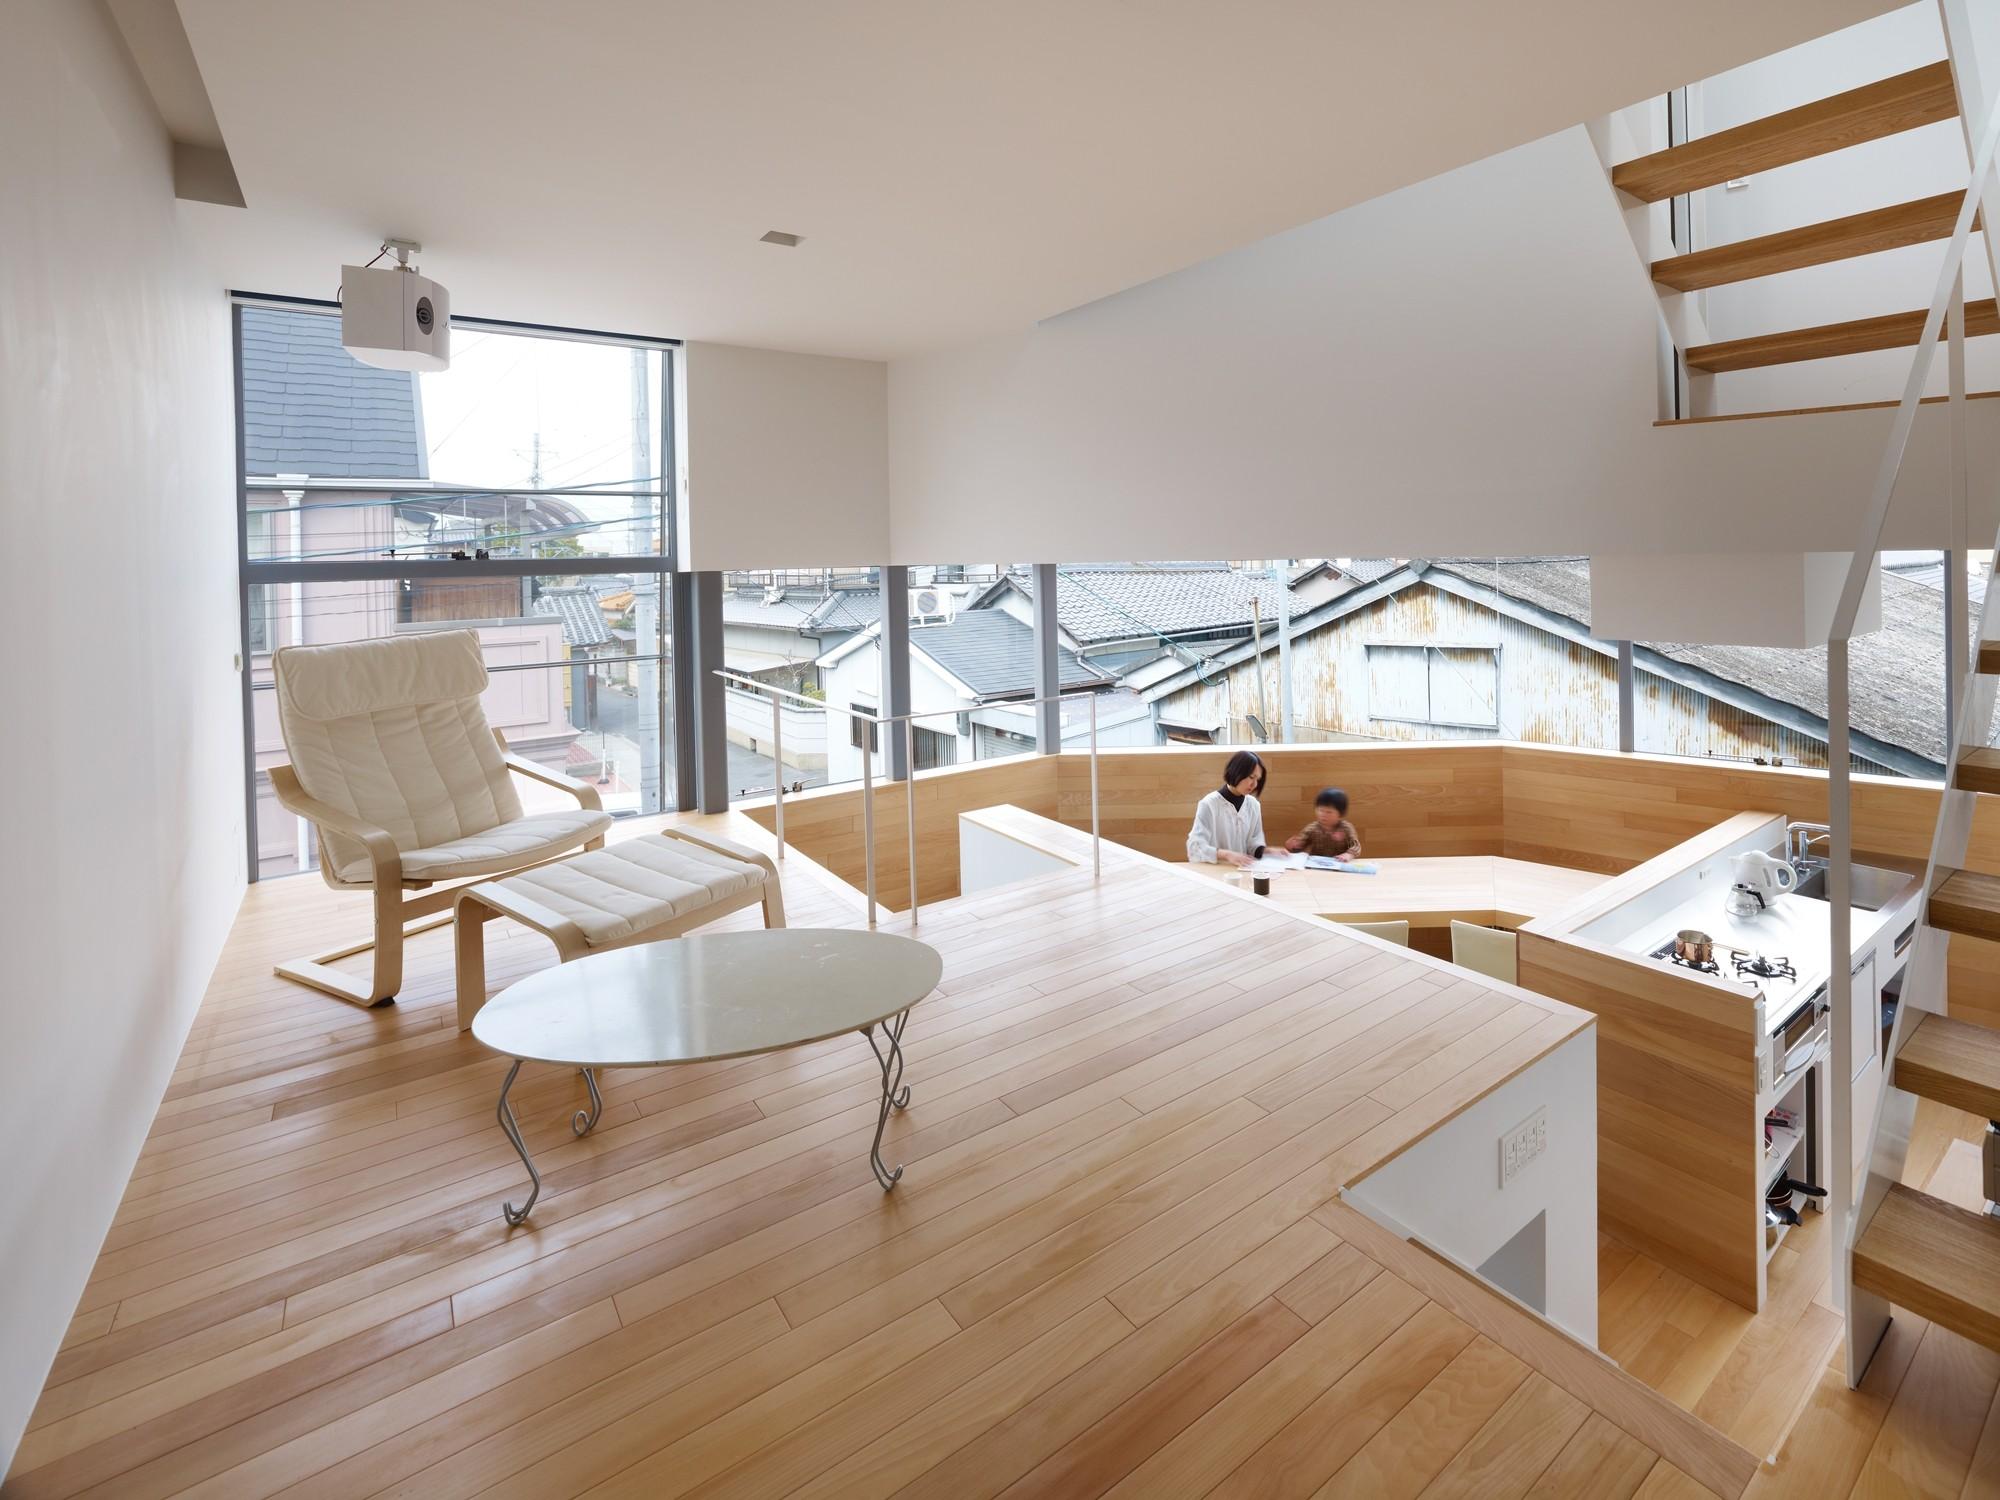 Gallery Of House In Matubara Fujiwaramuro Architects 1